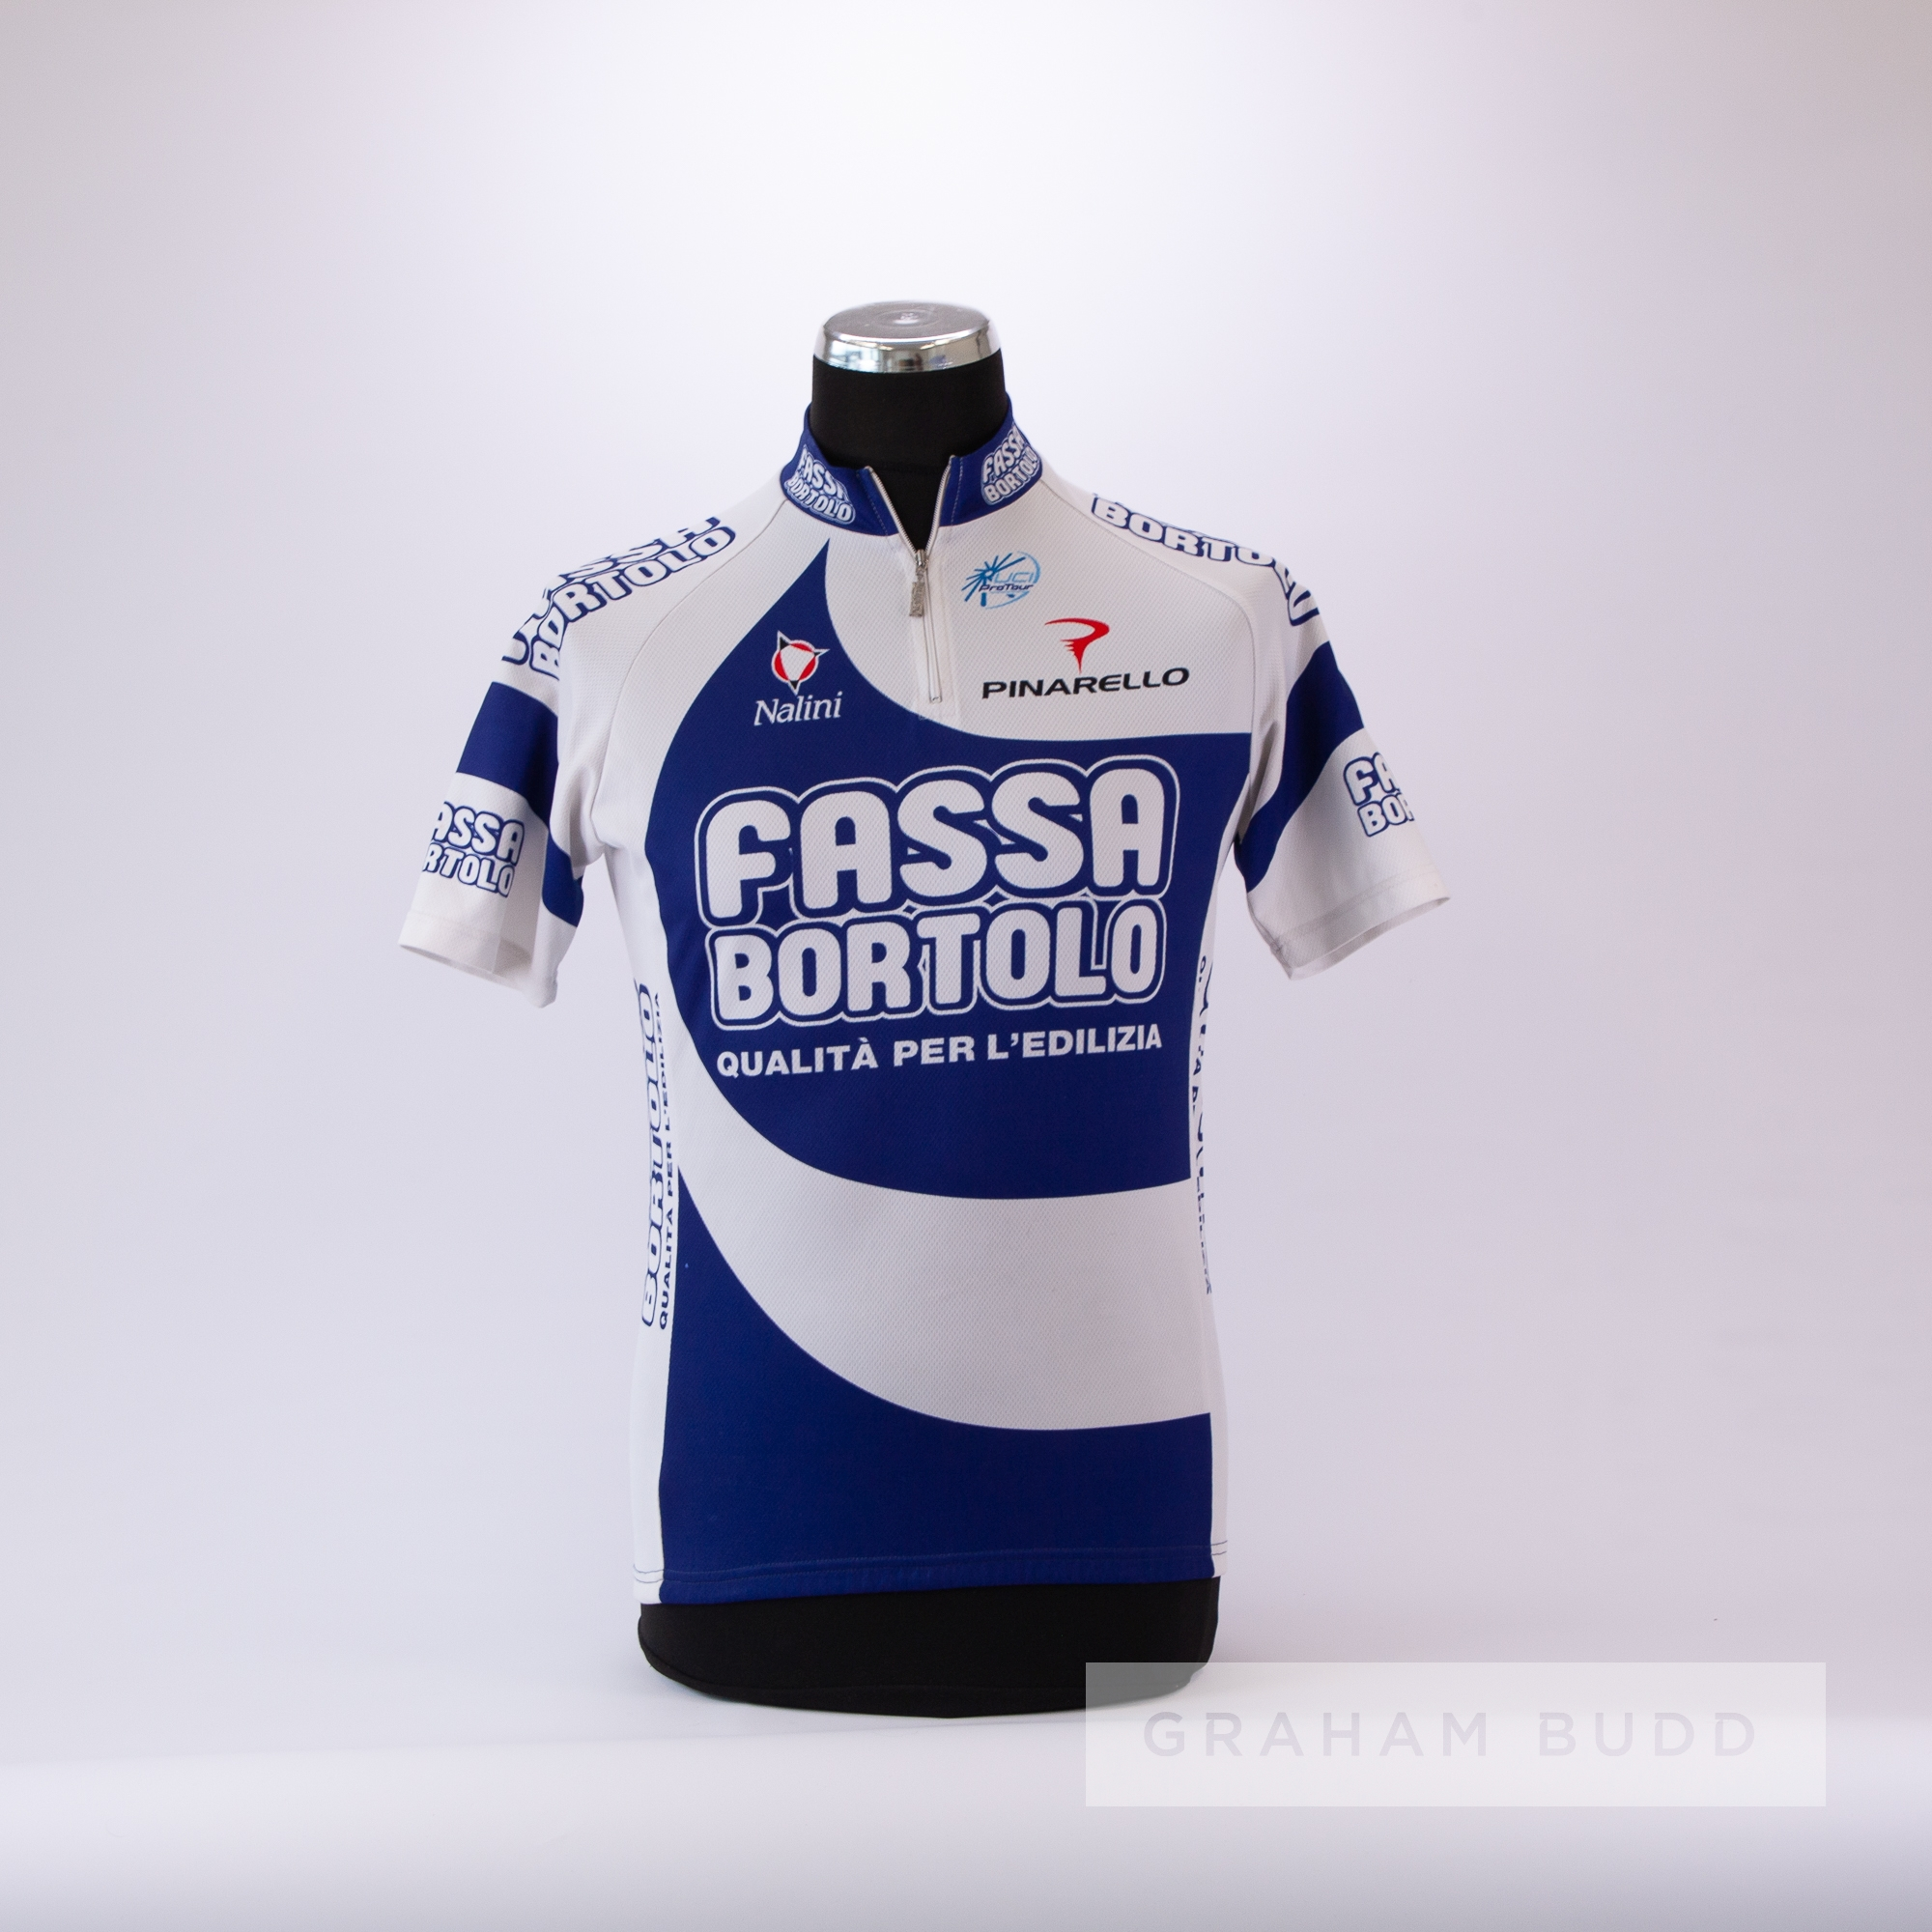 2000 white and blue Italian Fassa Bortolo Cycling race jersey, scarce, polyester short-sleeved - Image 3 of 4